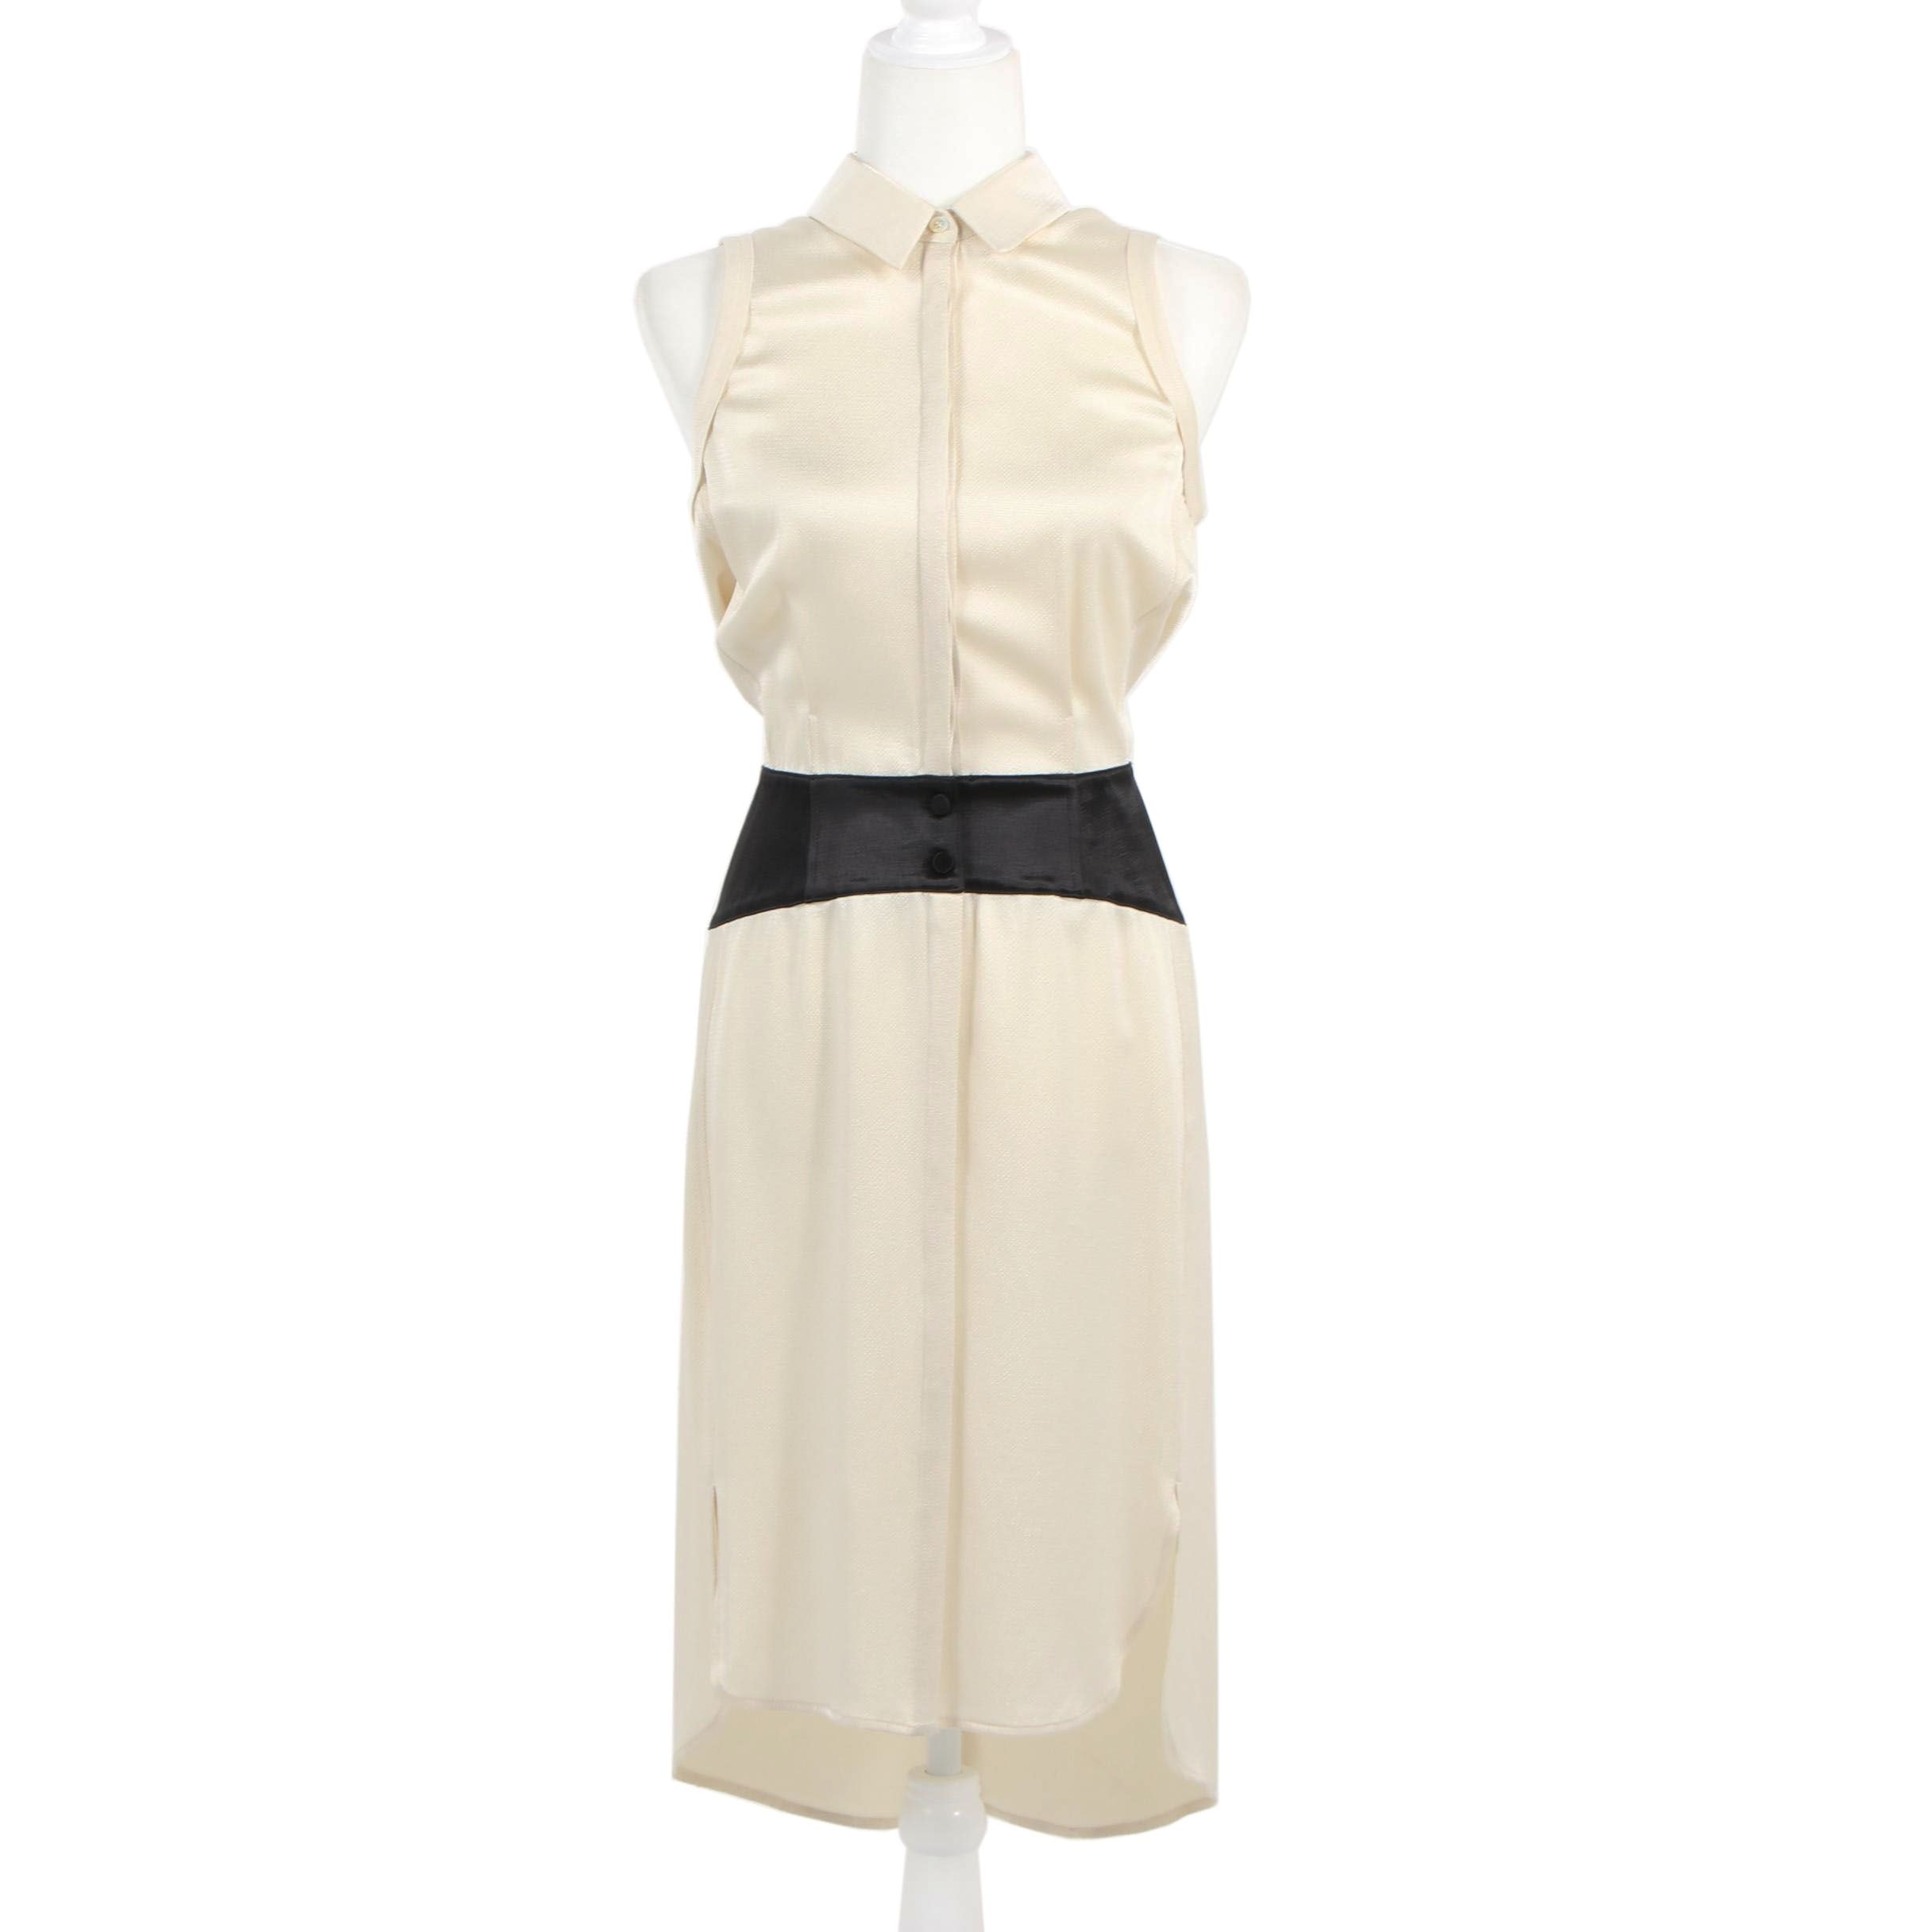 Alexander Wang Ivory and Black Hammered Silk Sleeveless Dress